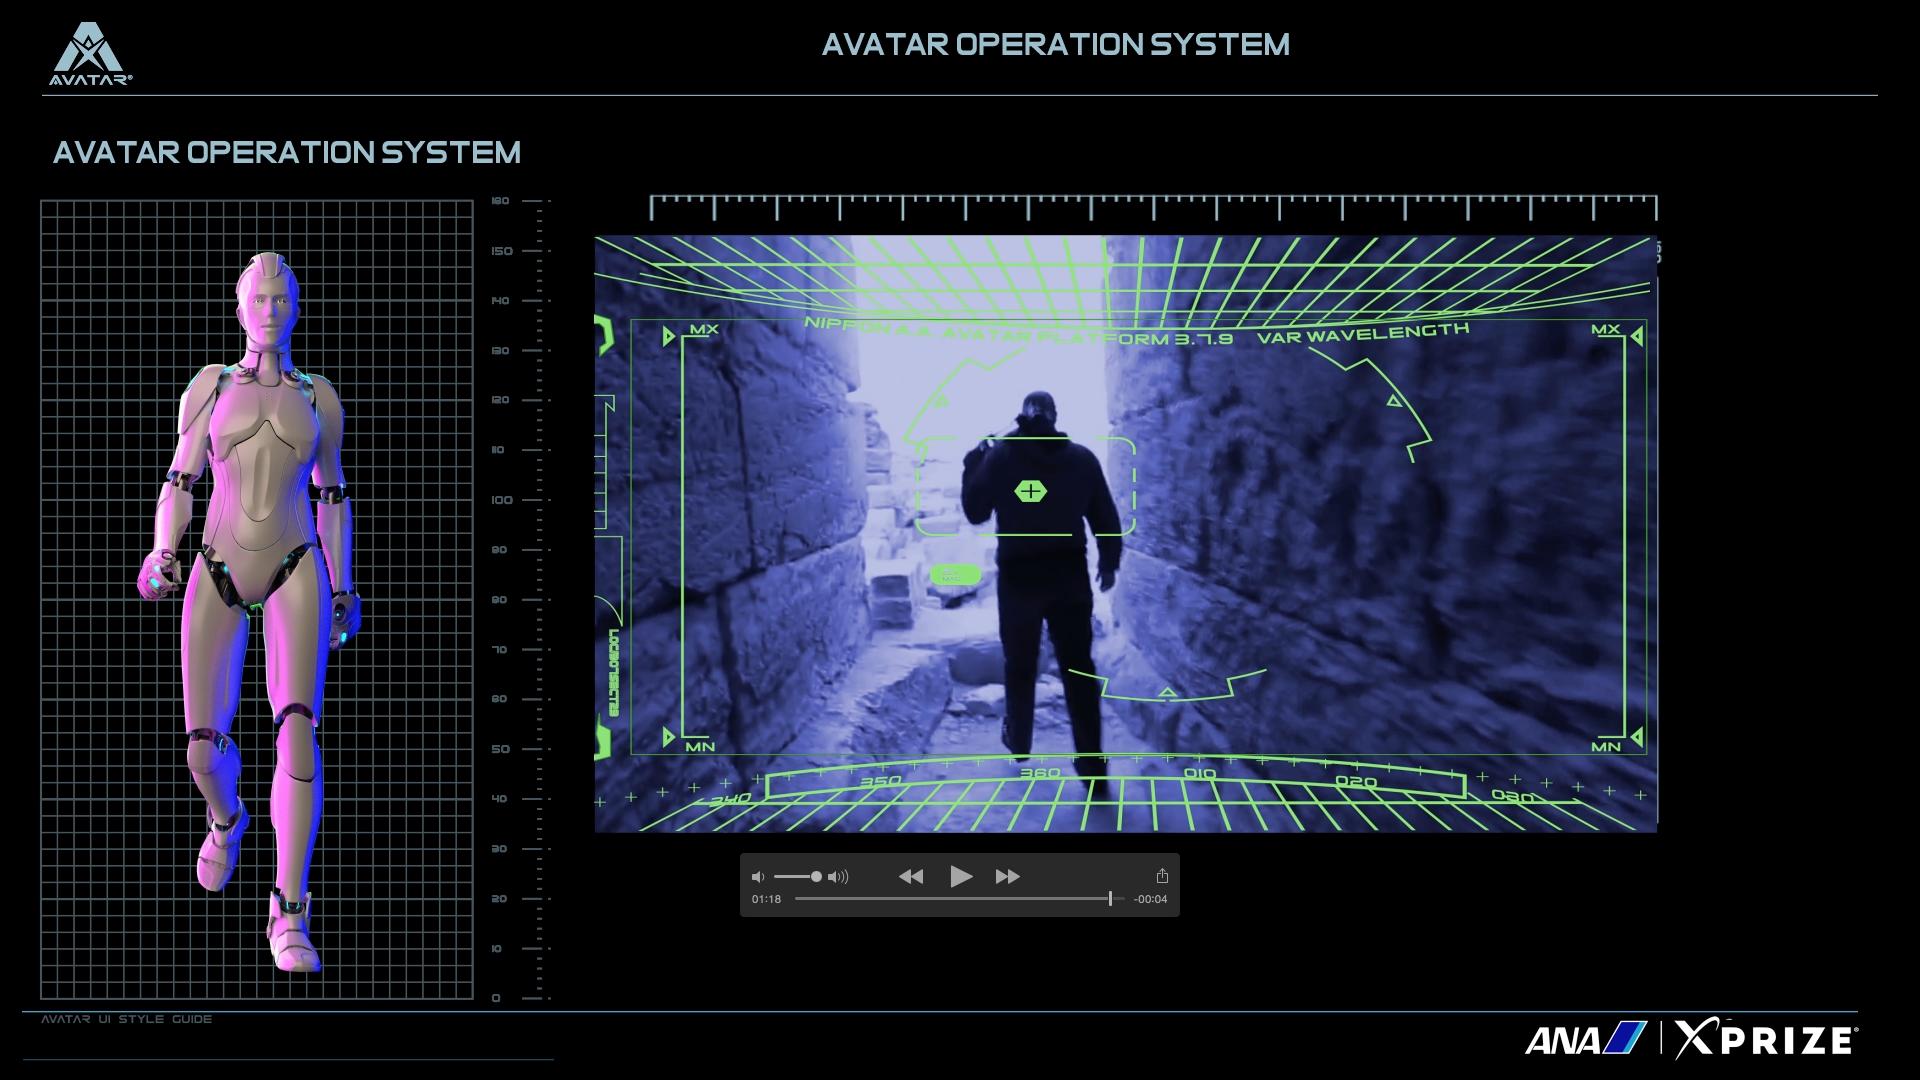 XPRIZE даст $10 млн тому, кто разработает робота-аватара - 2